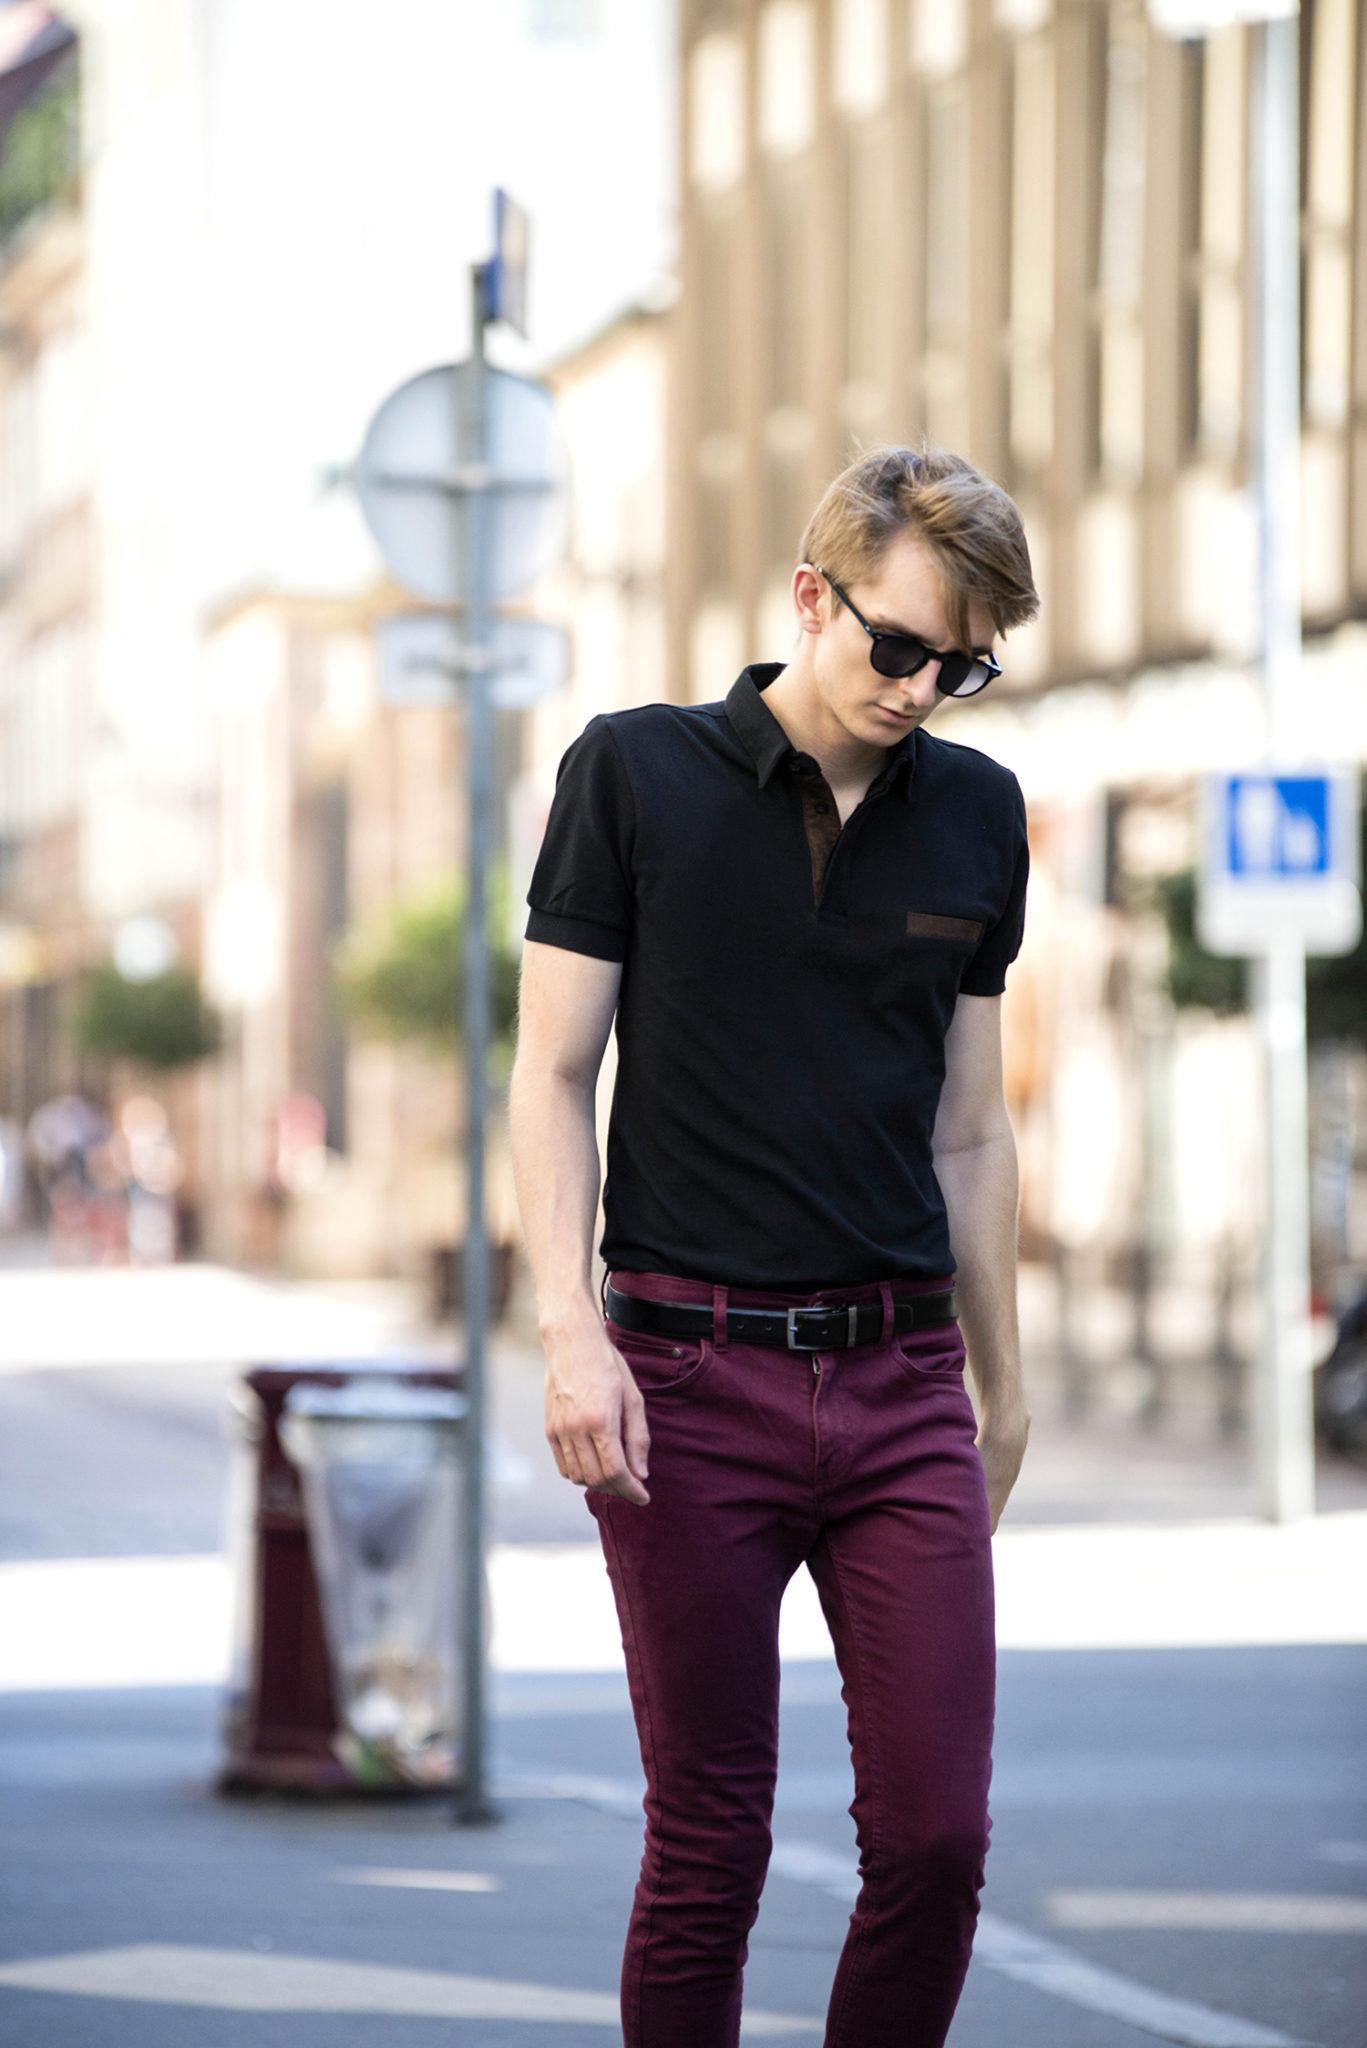 blog-mode-homme-strasbourg-paris-blogueur-fashion-blogger-man-men-french-streetstyle-lookbook-vinifera-alsace-france-1